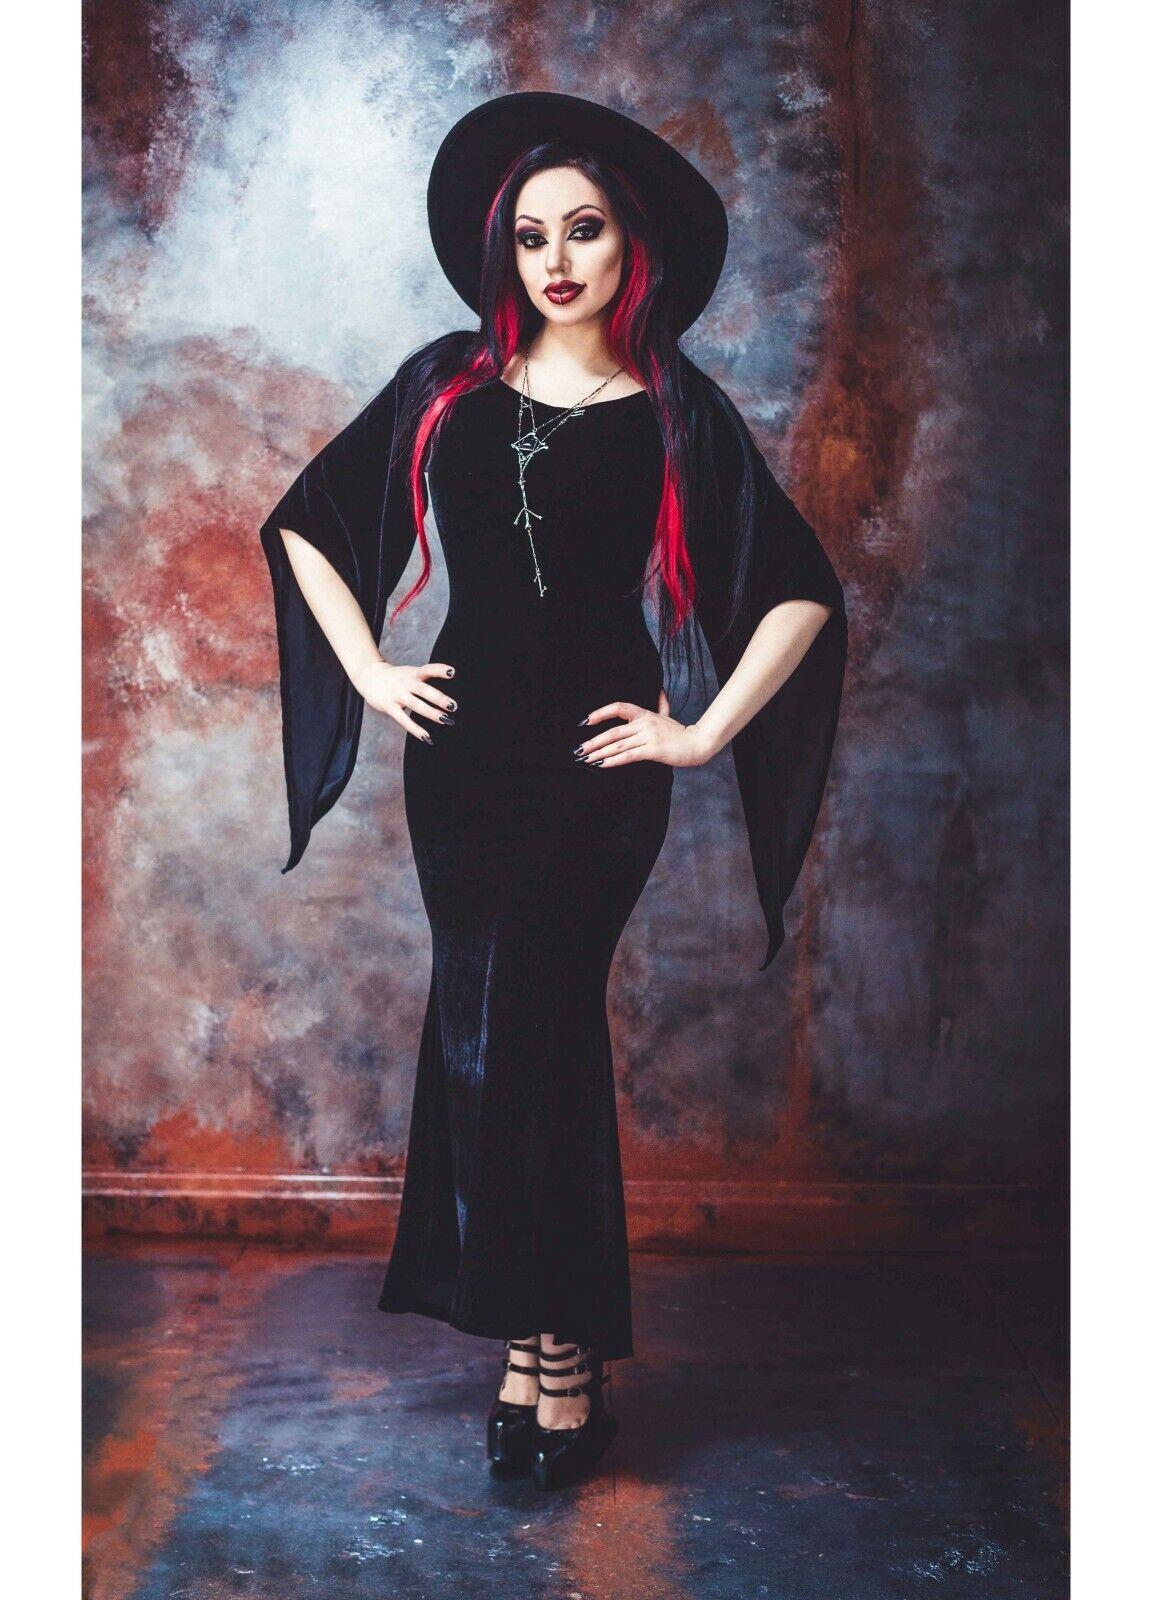 Necessary Evil Freya Velours Punk Gothique Sorcière Alternative Maxi Robe N1282